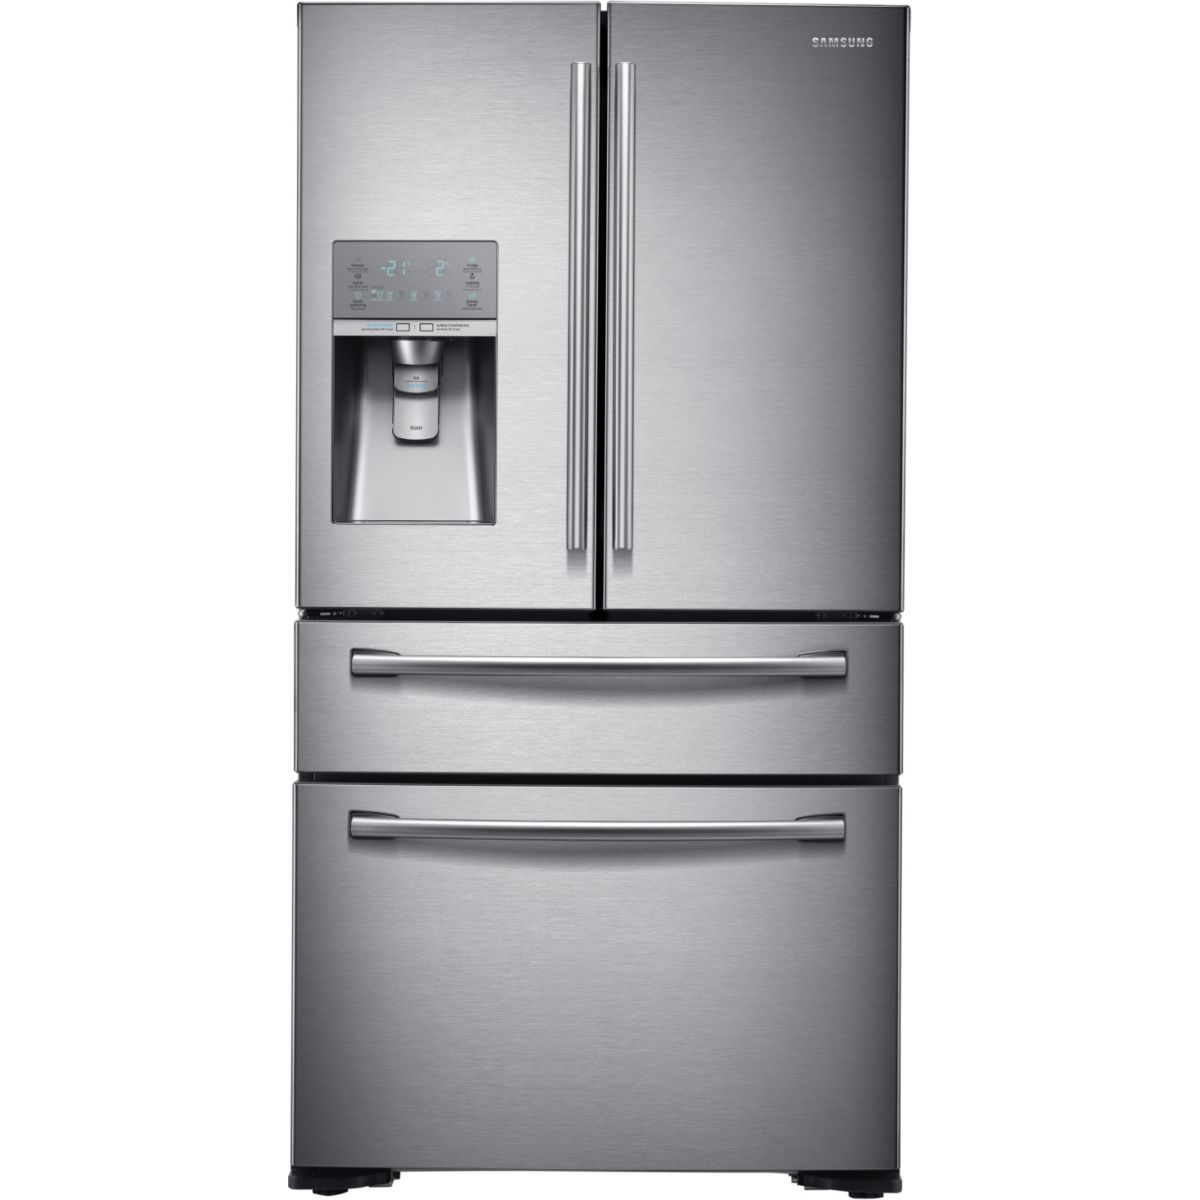 Réfrigérateur multi portes SAMSUNG RF24HSESBSR